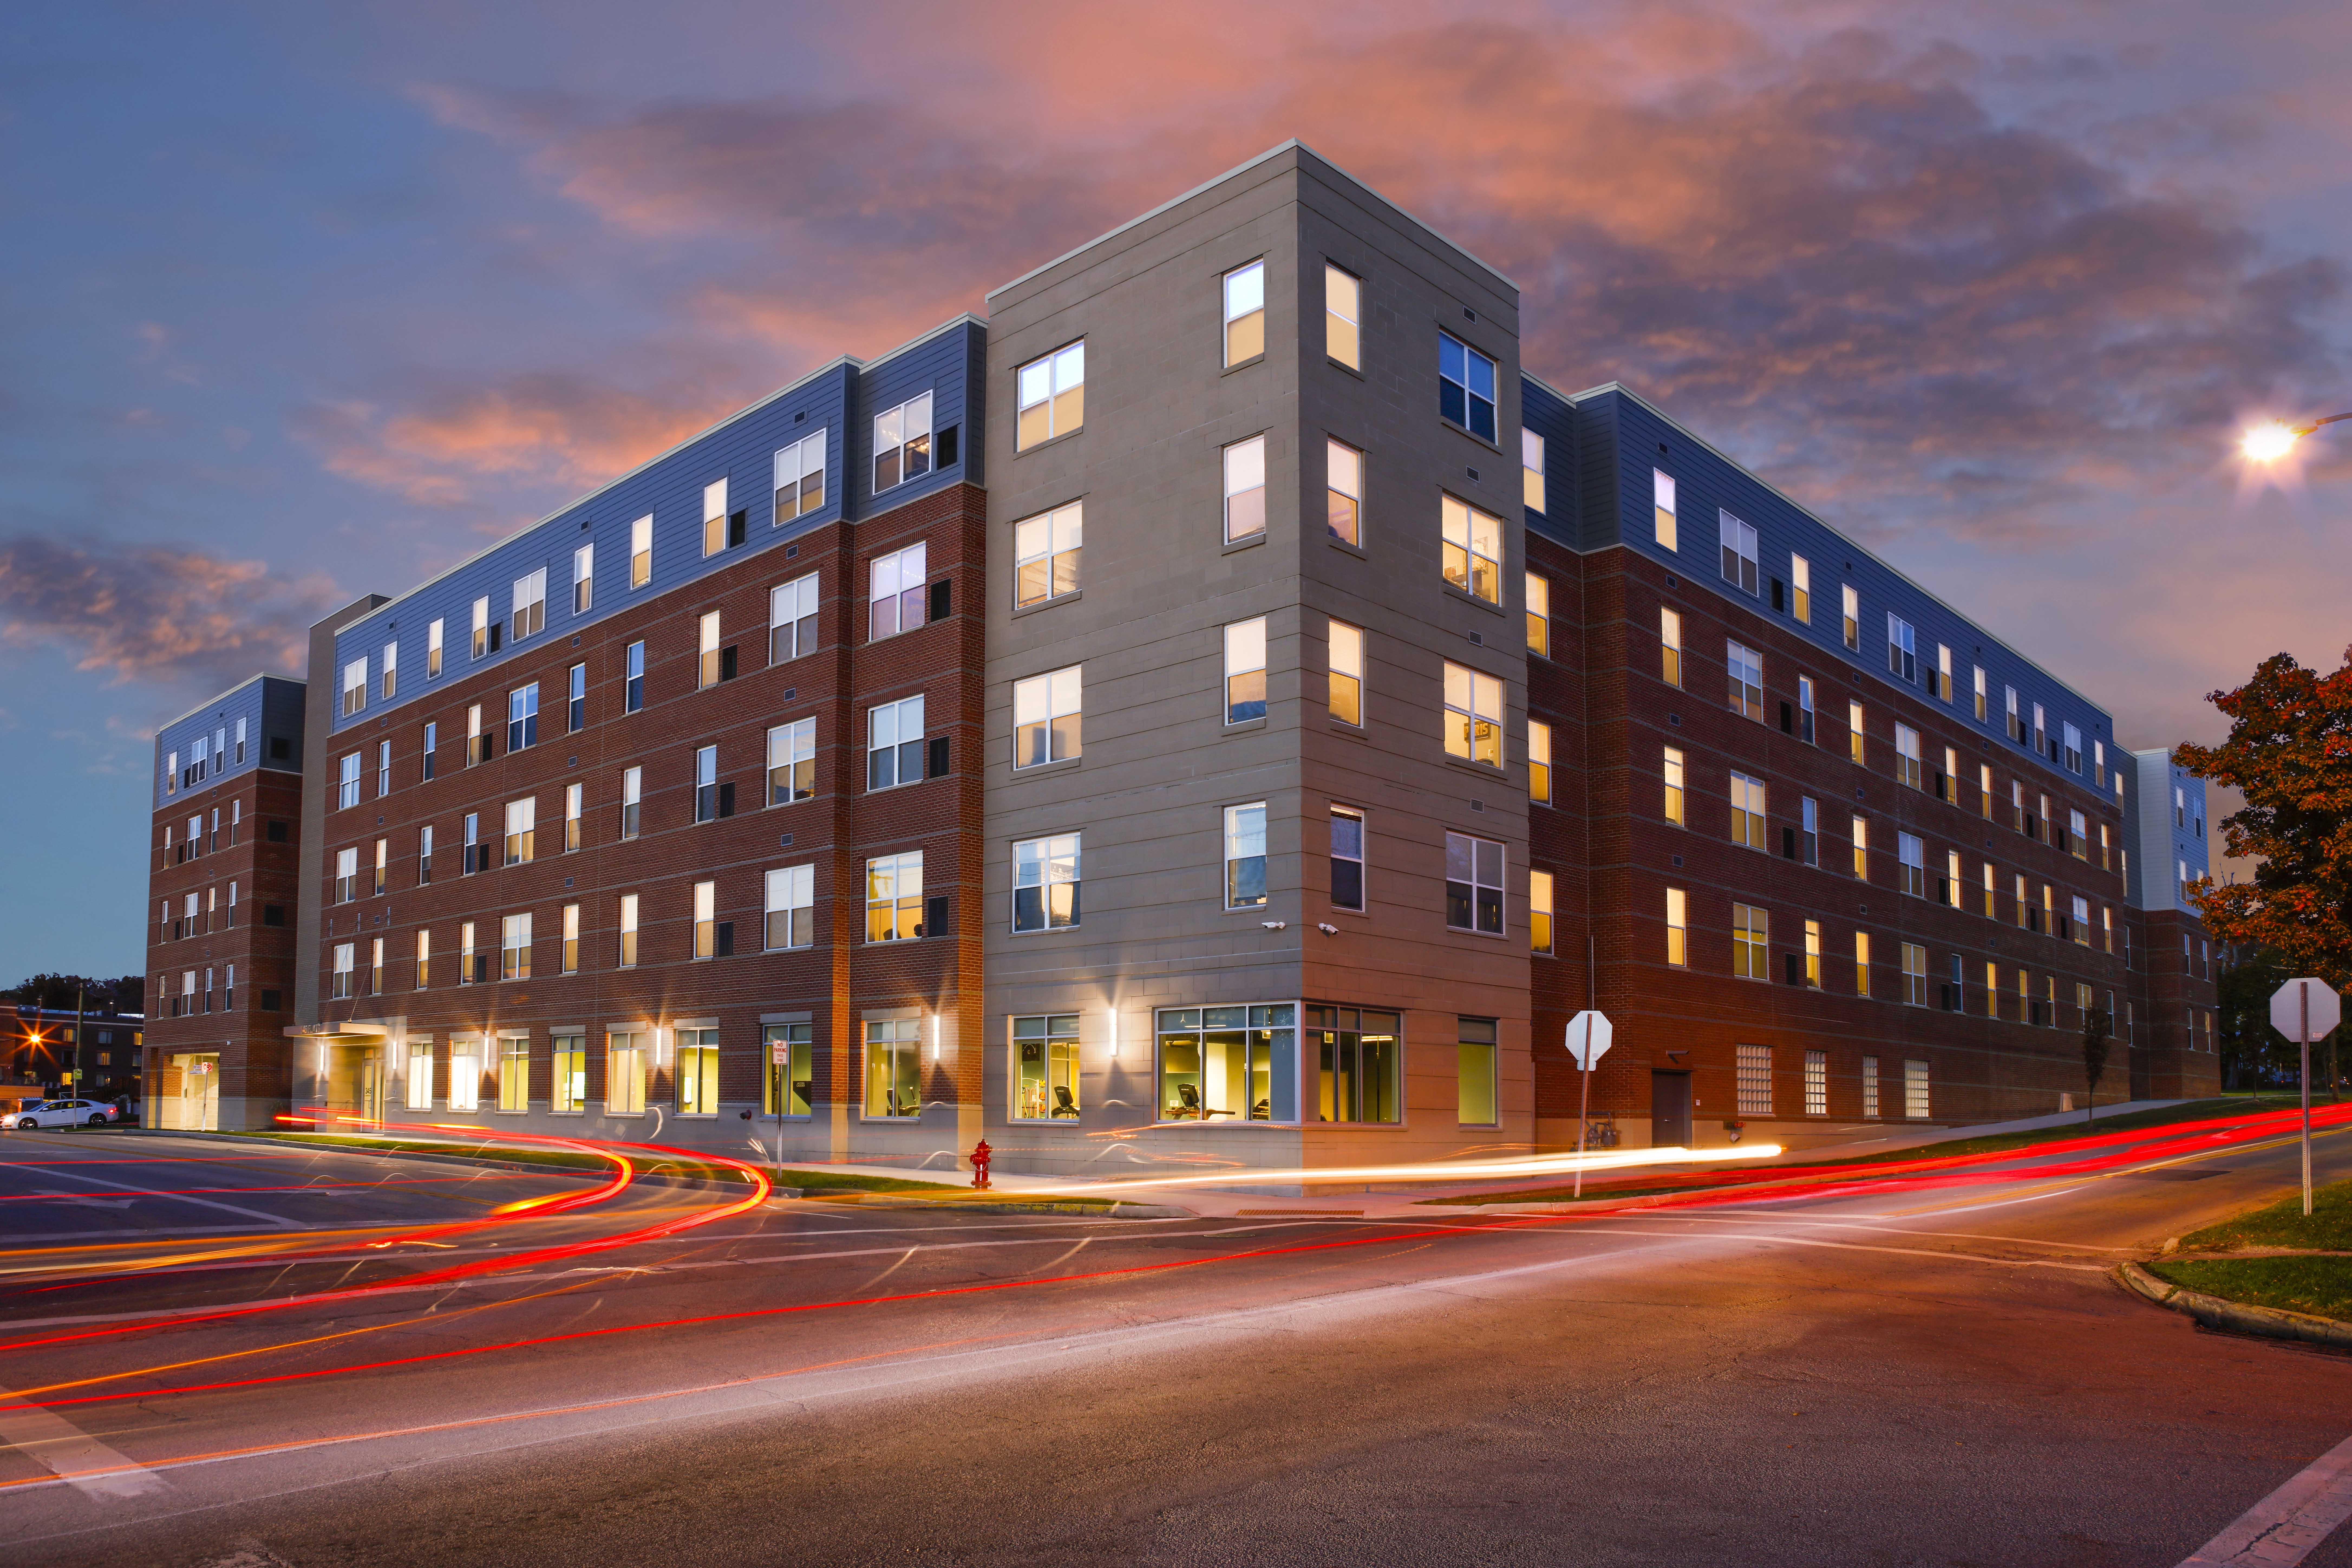 345 Flats exterior dusk